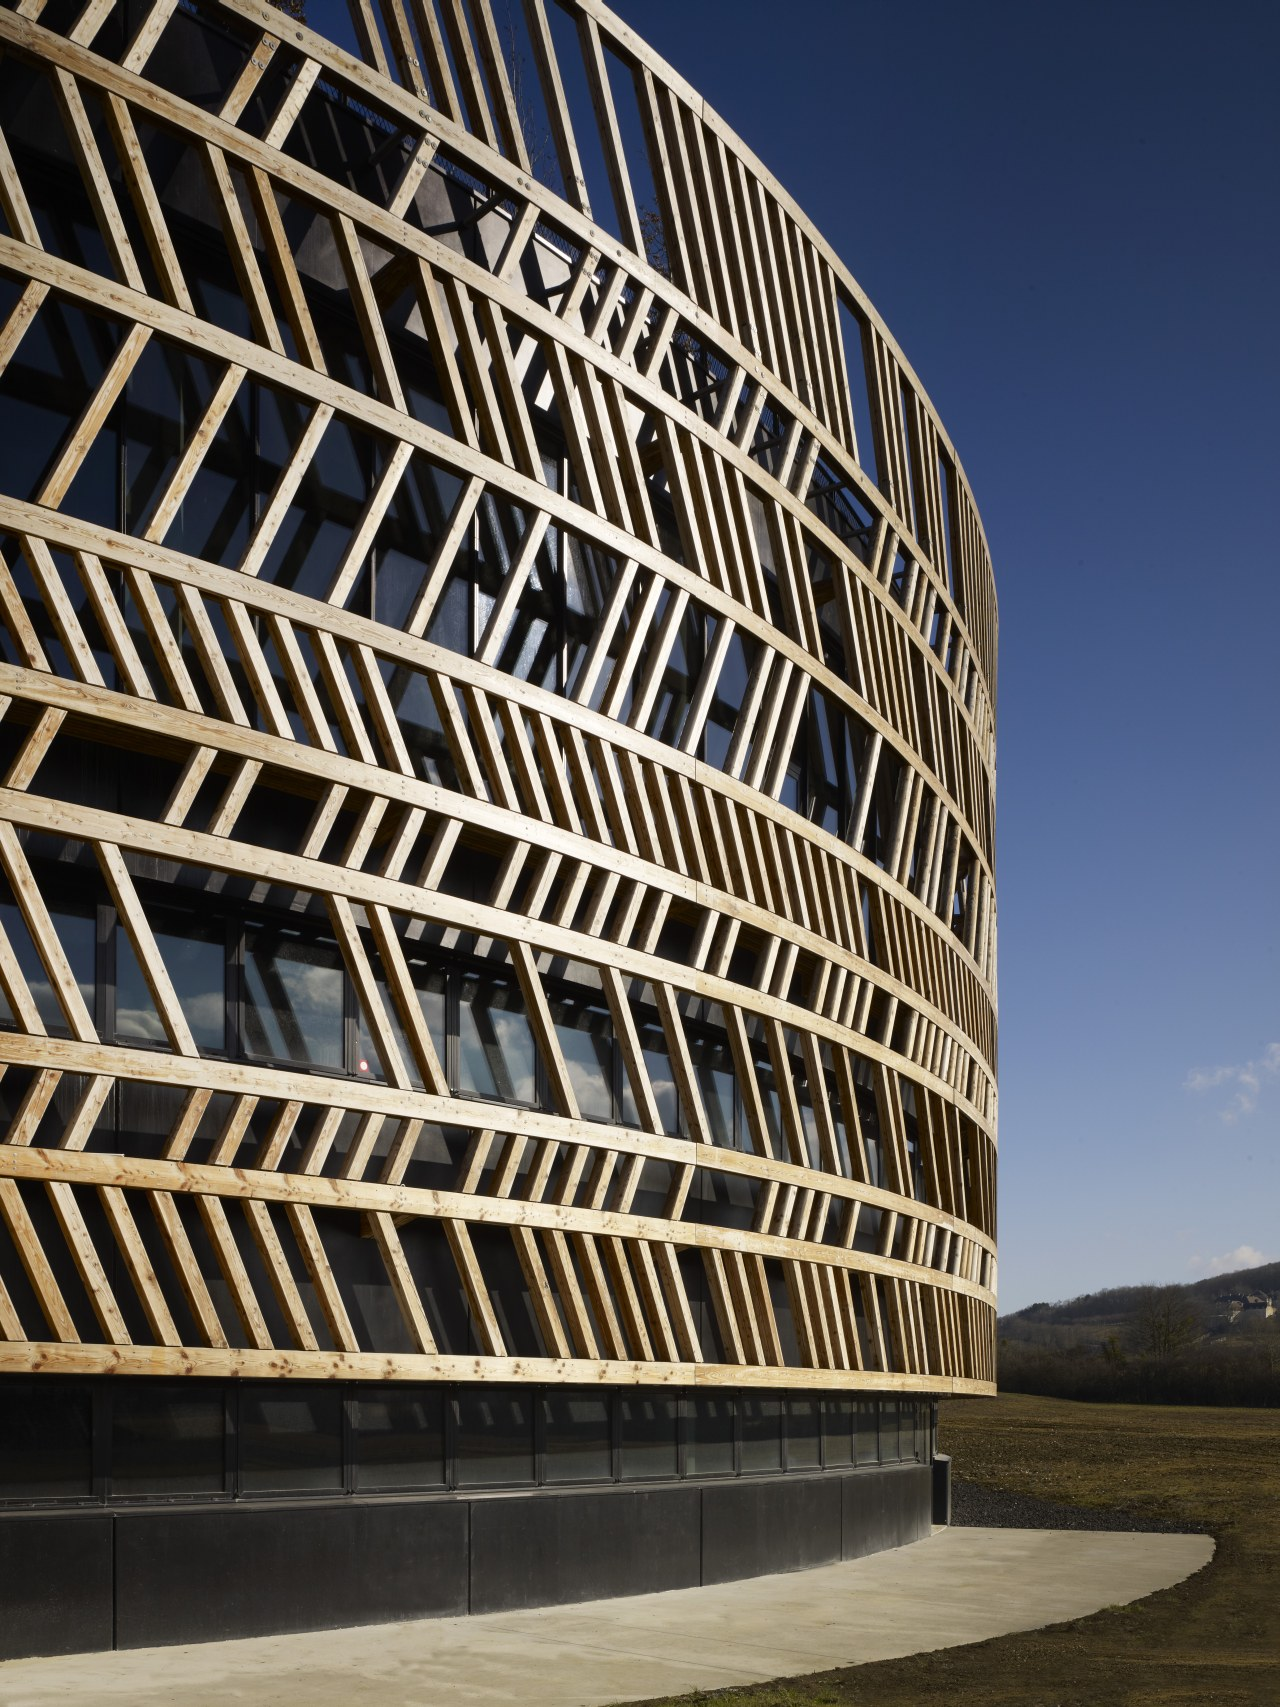 Gallery Of Alesia Museum Bernard Tschumi Architects 2